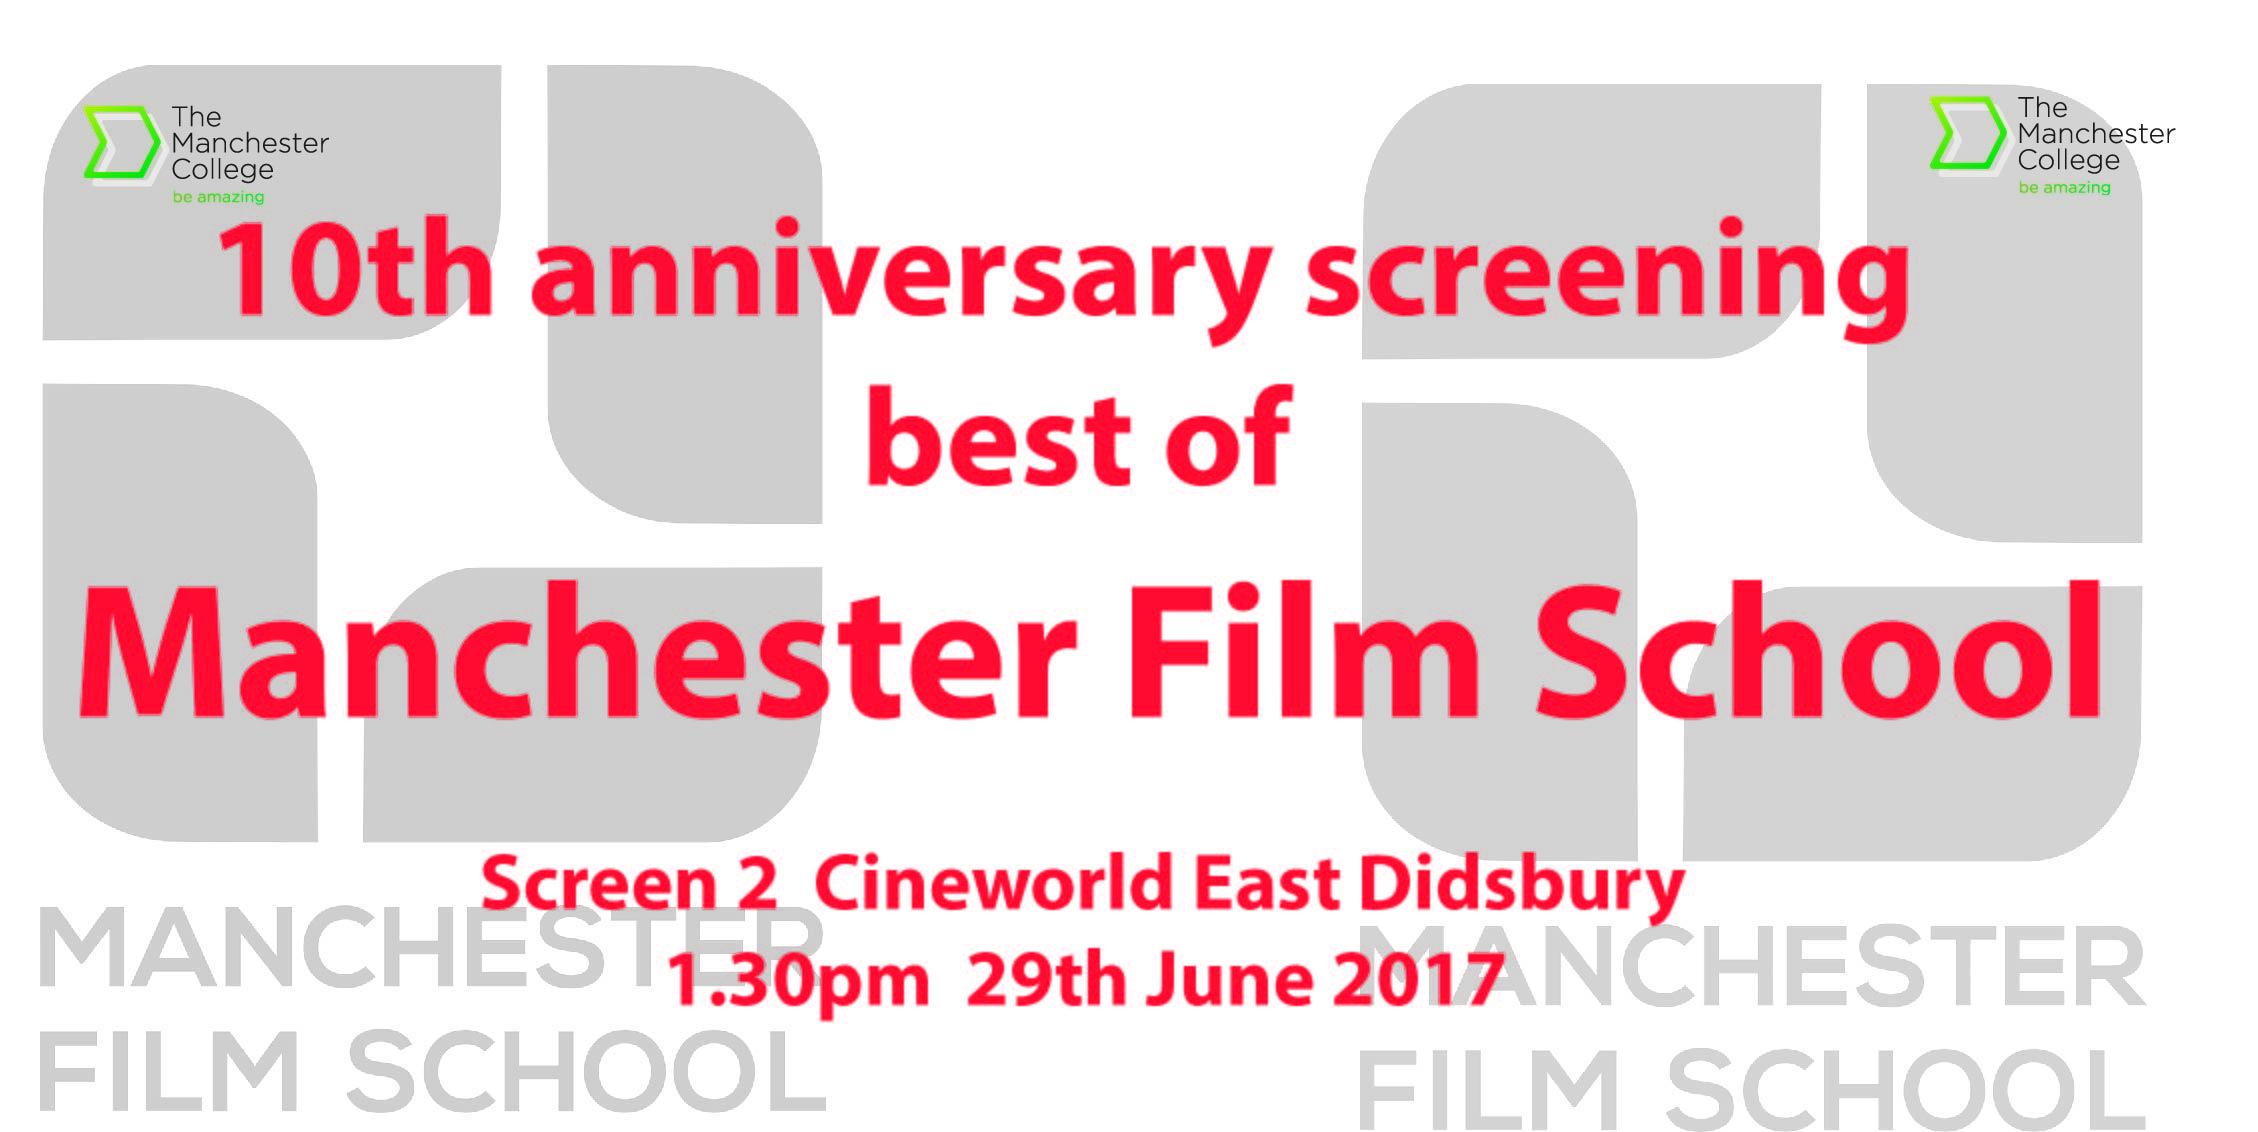 Best of Manchester Film School